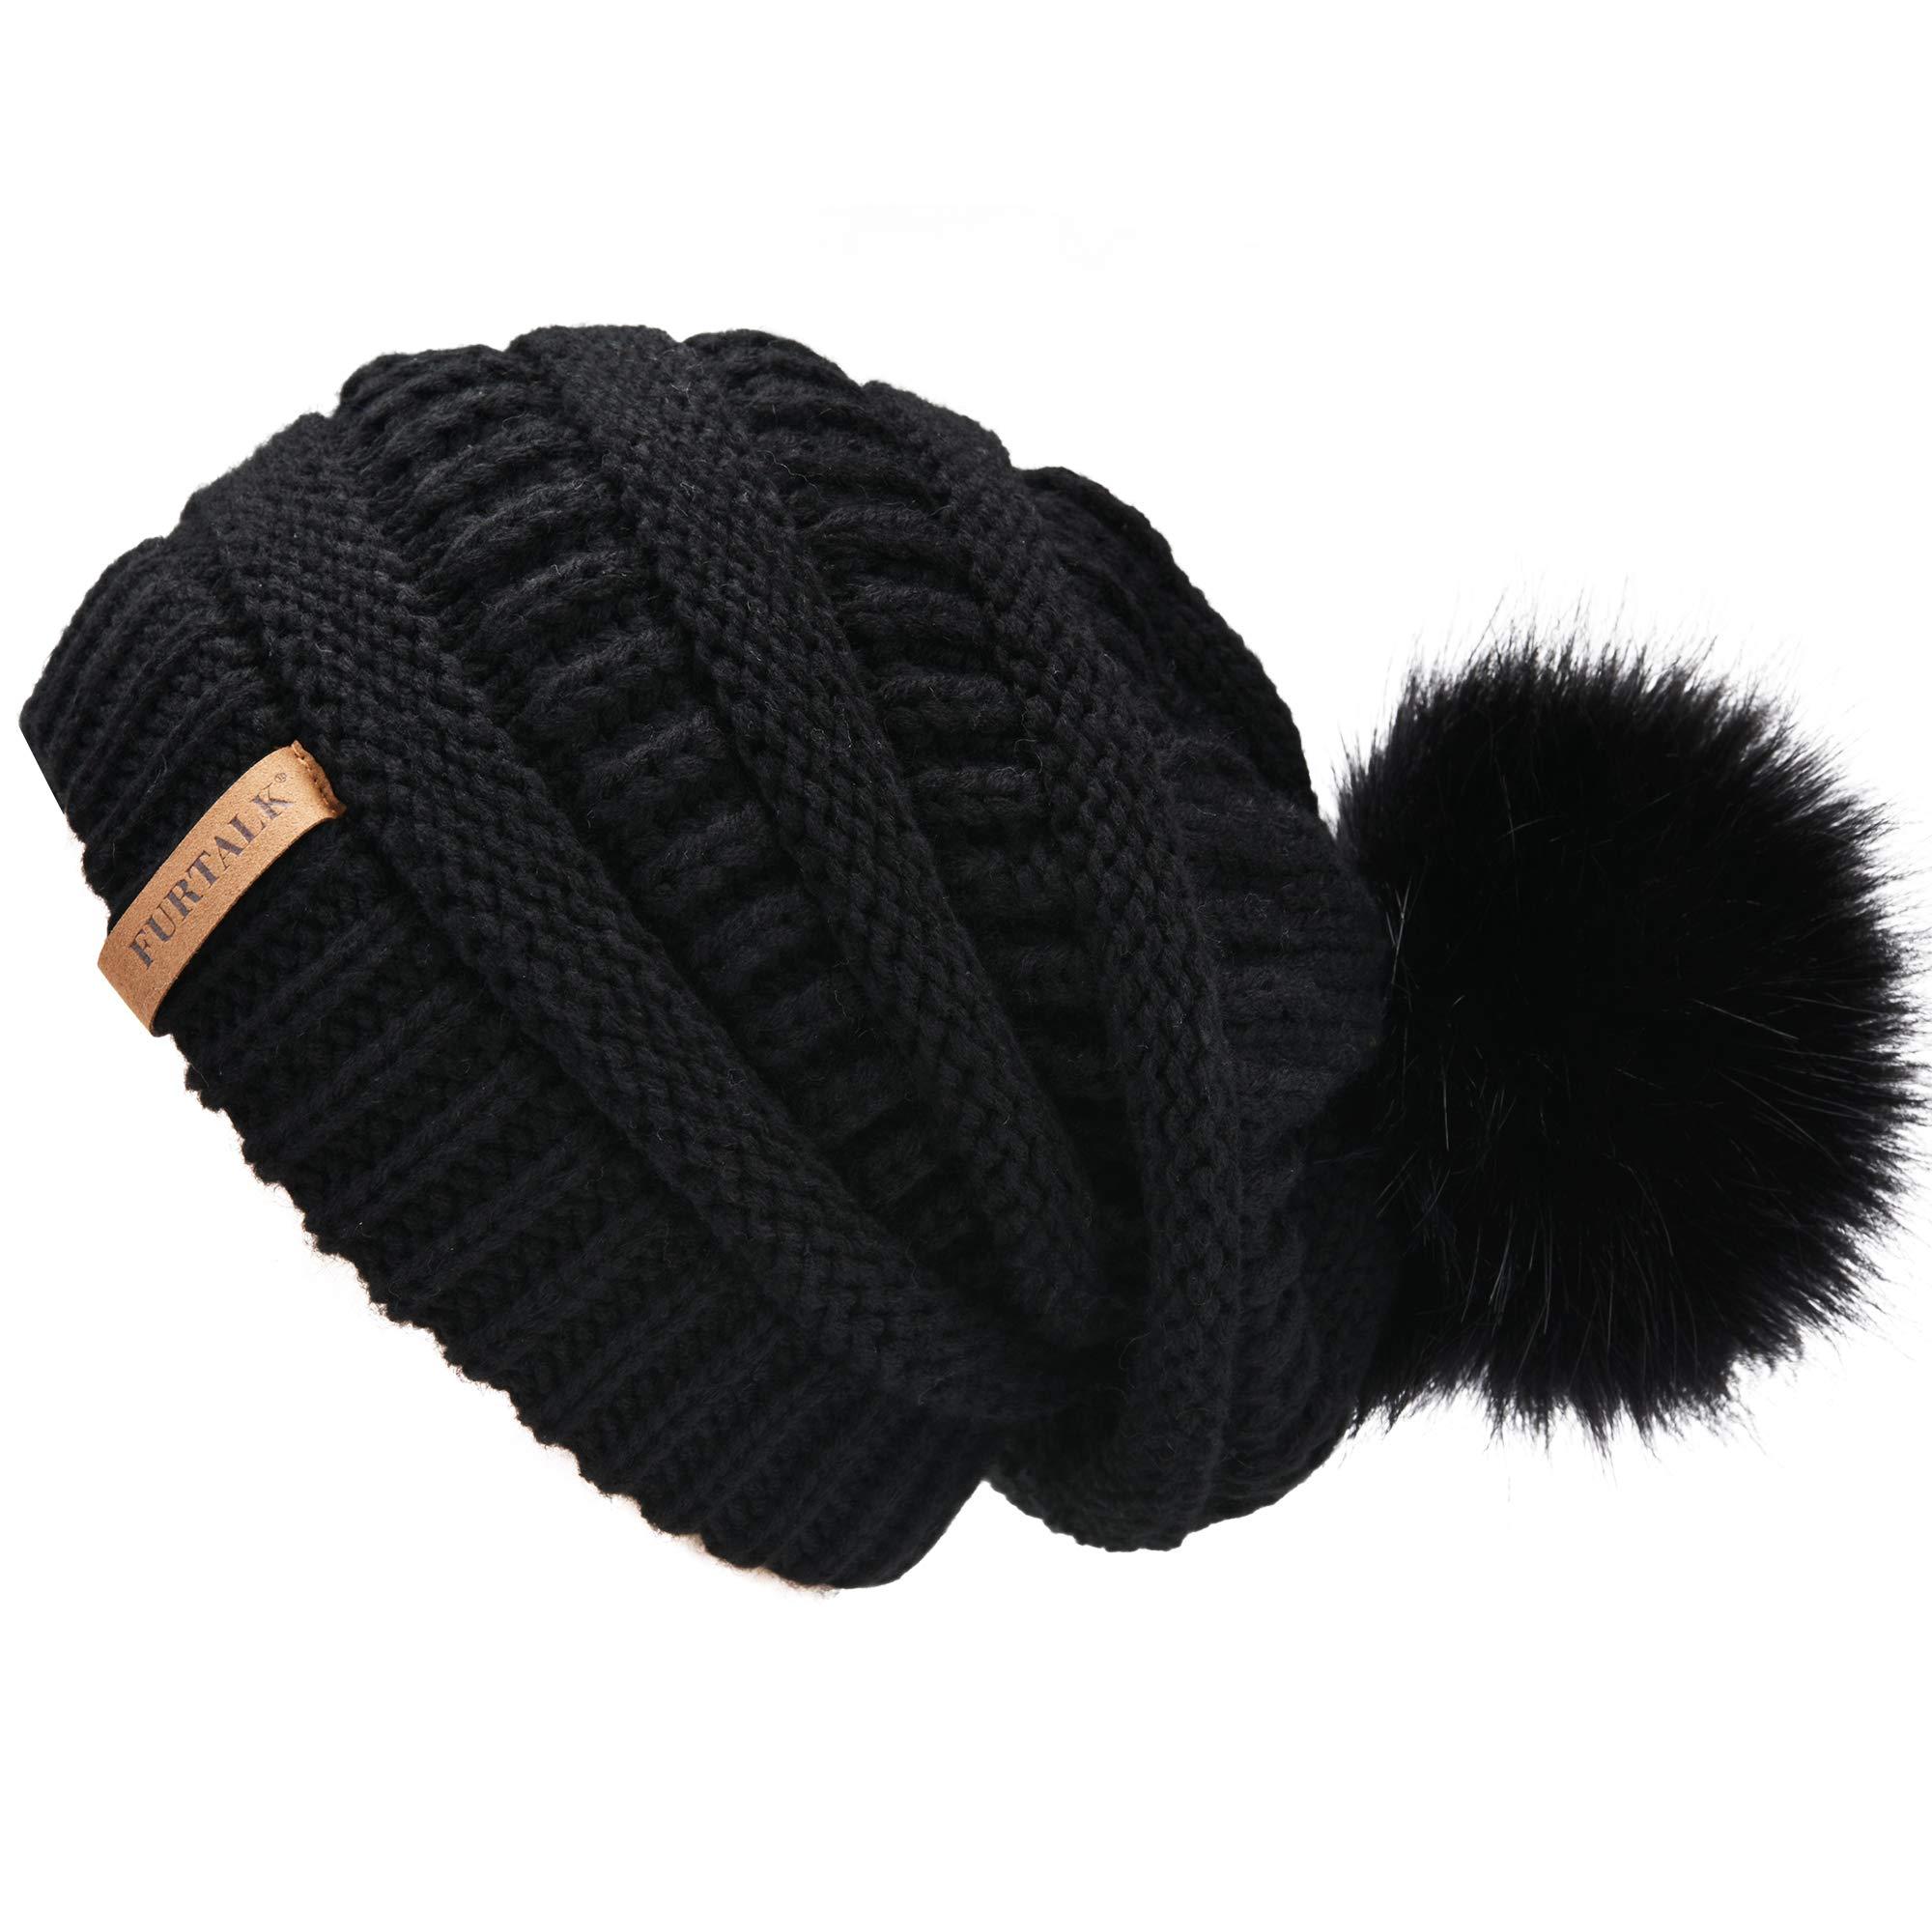 a7ef8ce1c3b FURTALK Women s Thick Slouchy Real Fox Raccoon Fur Pom Pom Winter Knit  Beanie Bobble Hat Caps